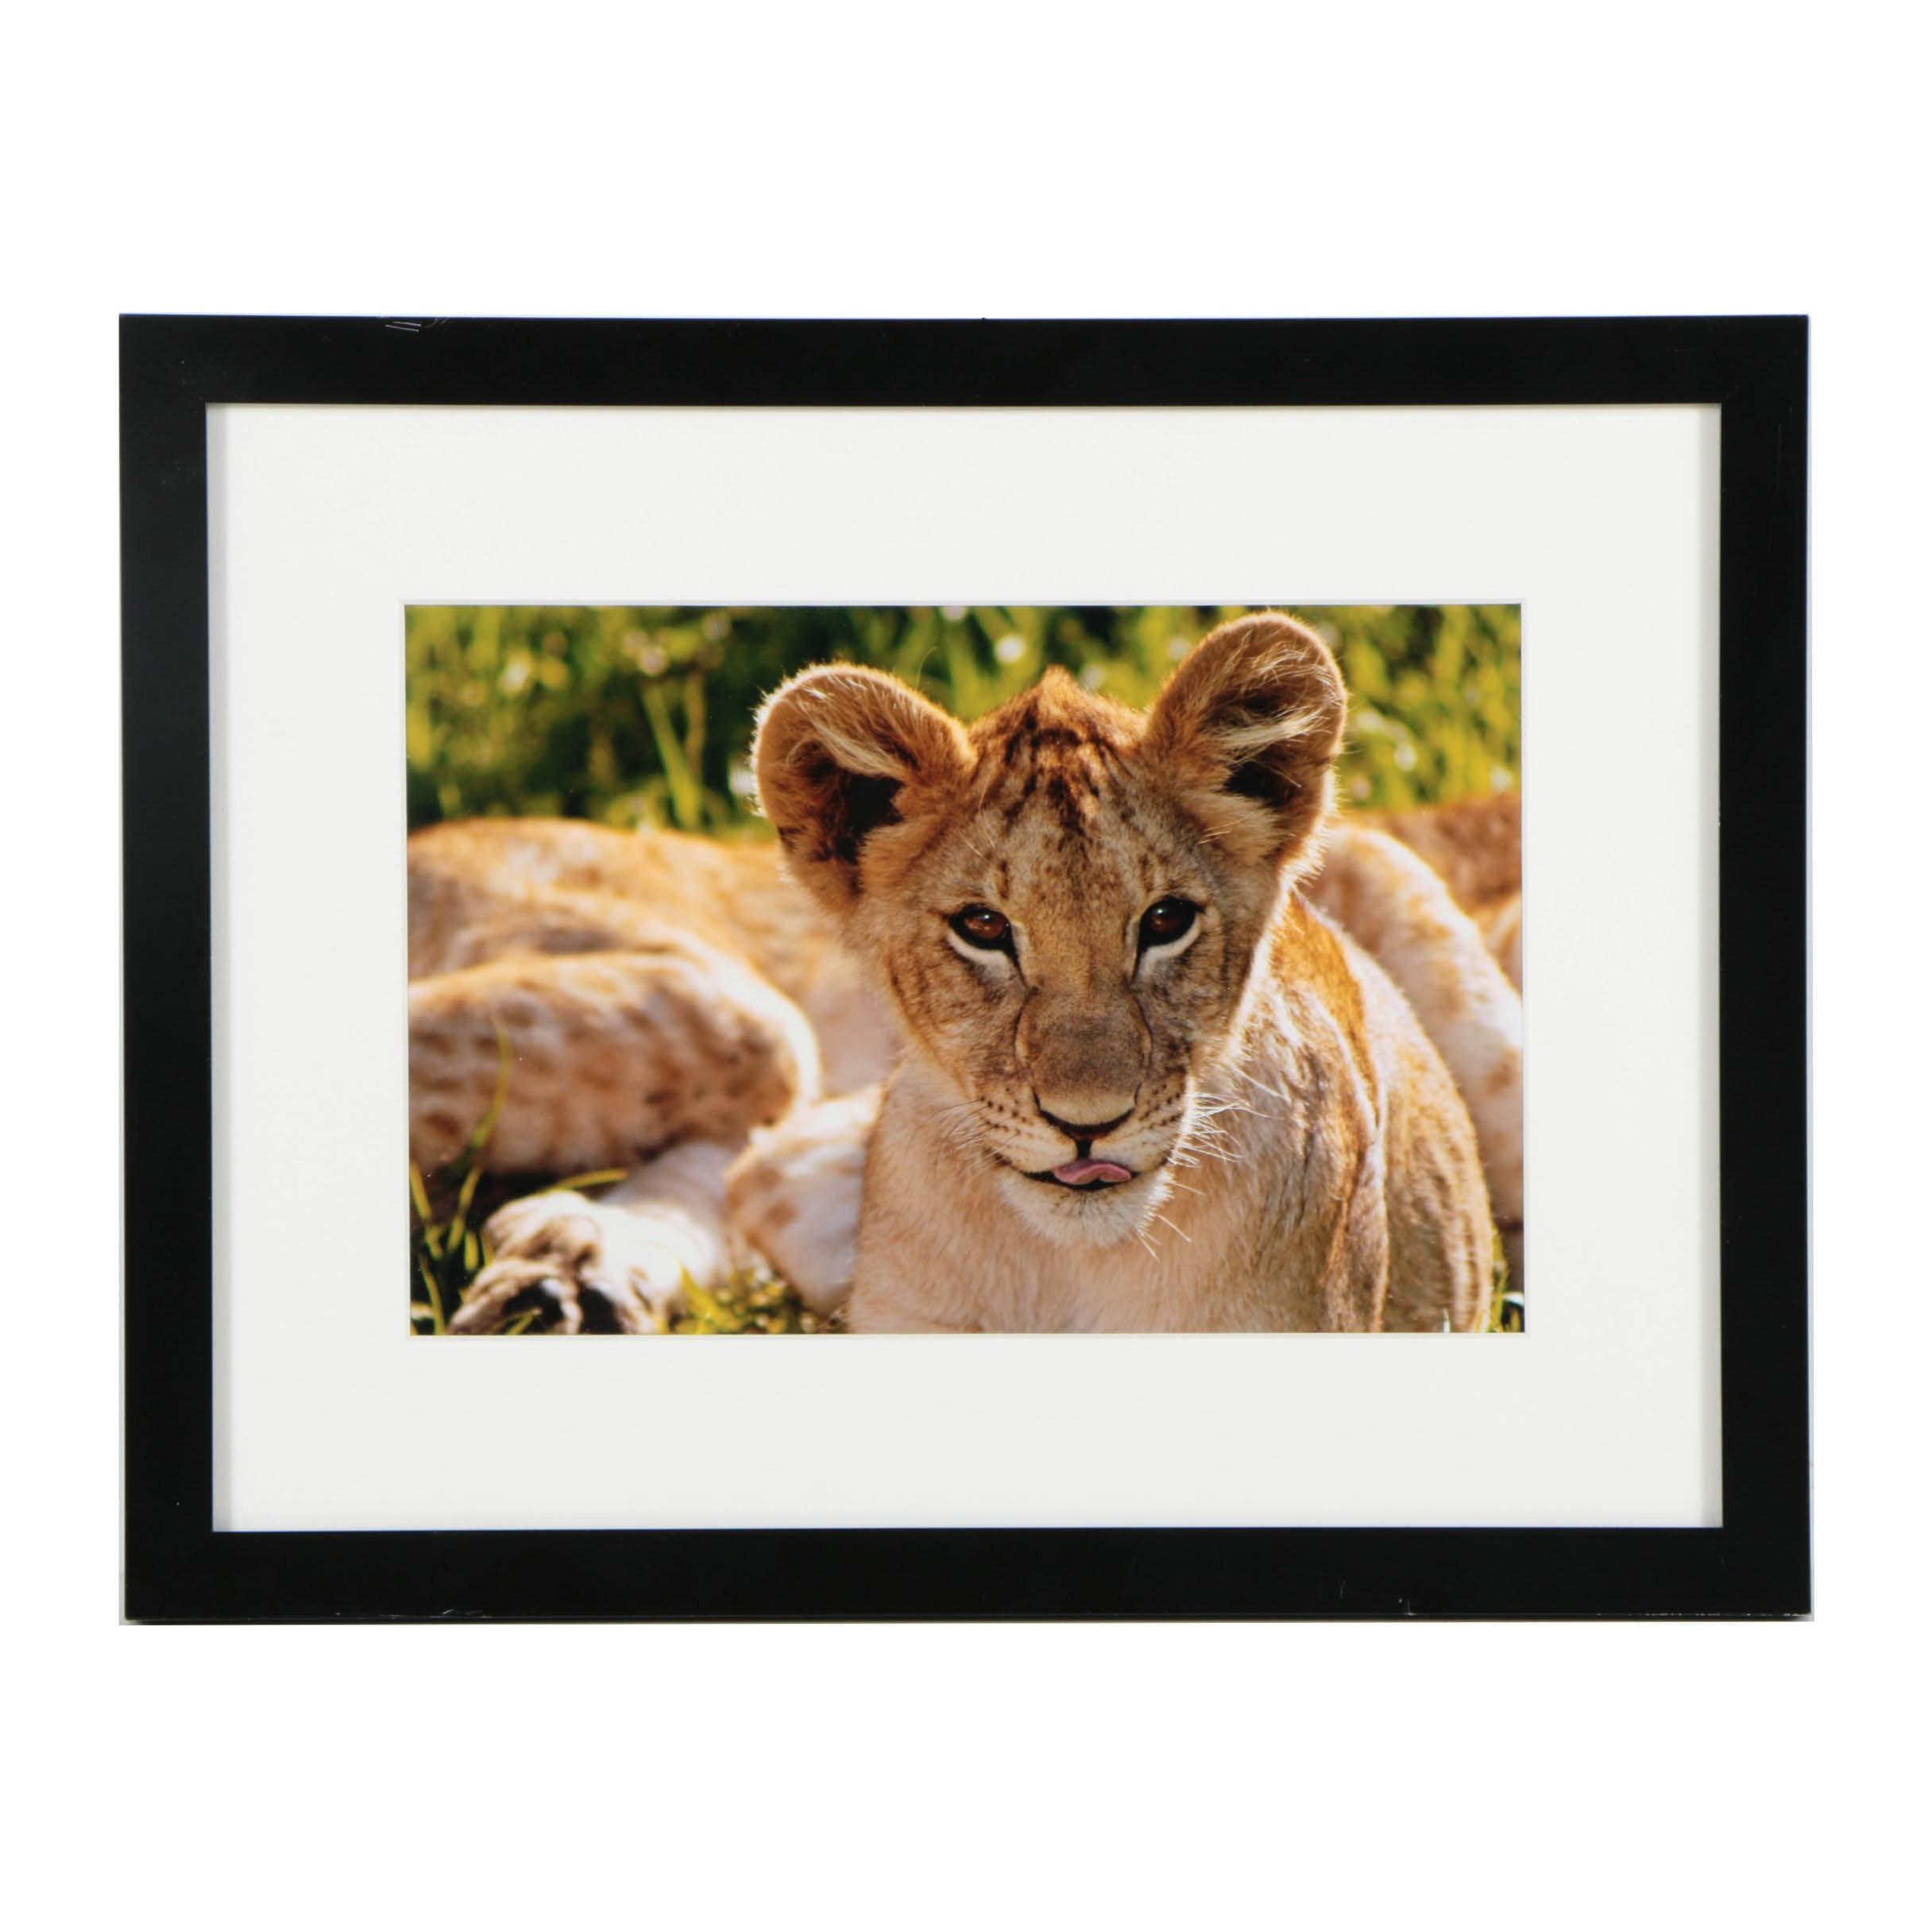 "Edwin Behrens Digital Photograph on Paper ""Lion Cub"""